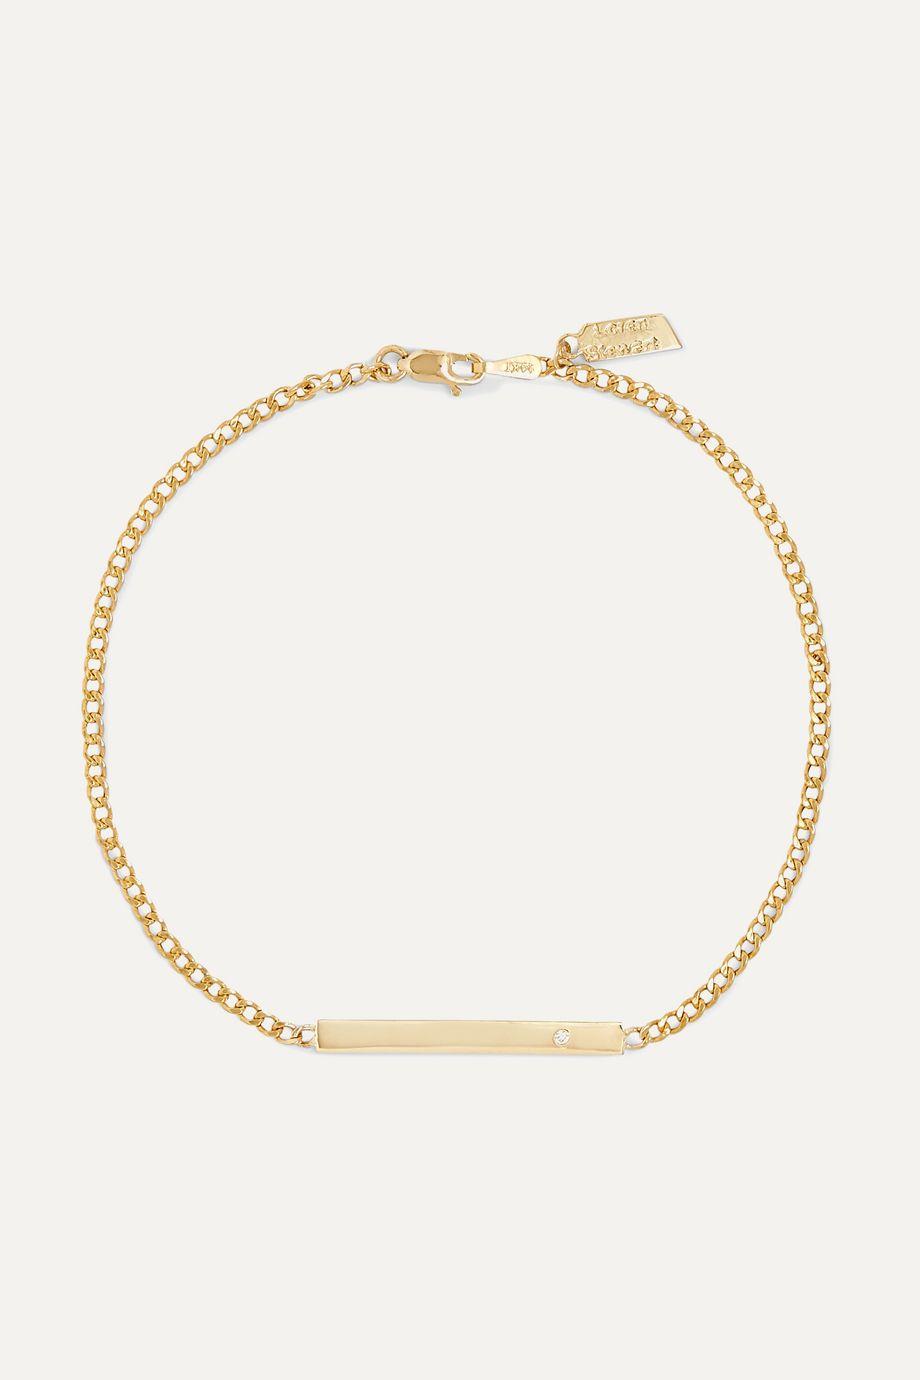 Loren Stewart Bracelet en or et diamant